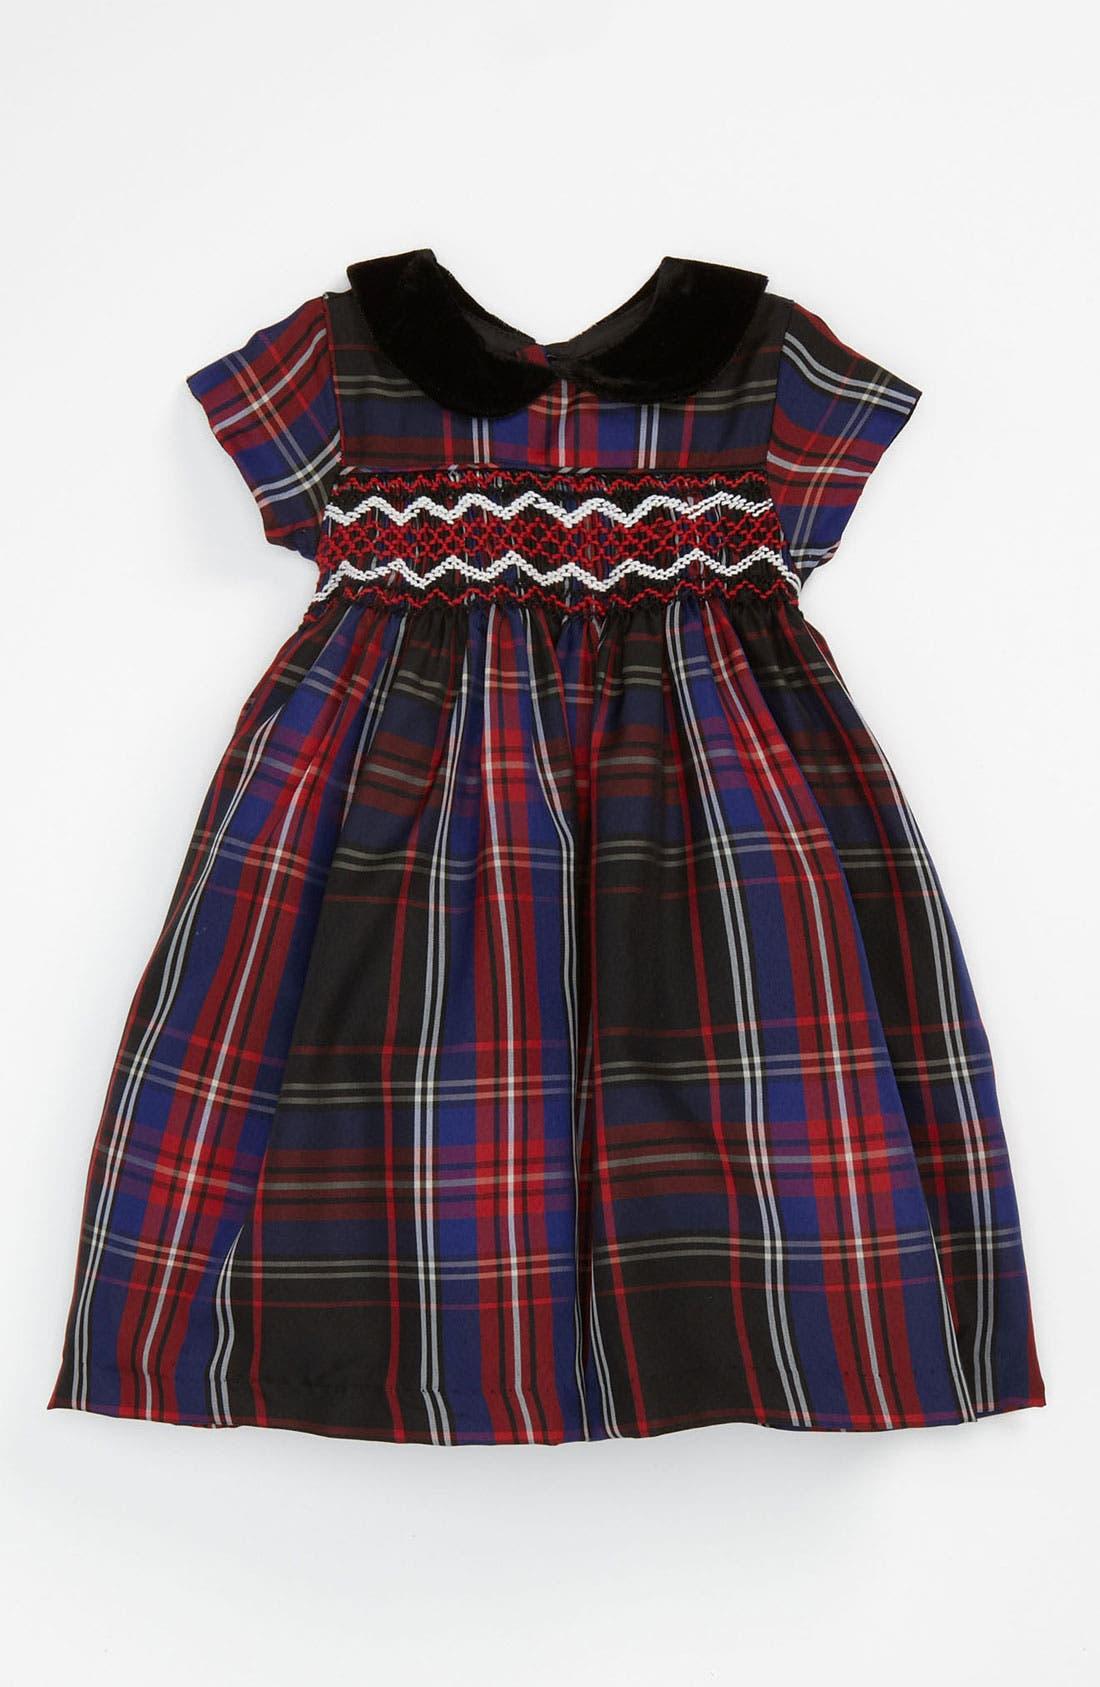 Alternate Image 1 Selected - Laura Ashley Plaid Dress (Toddler)